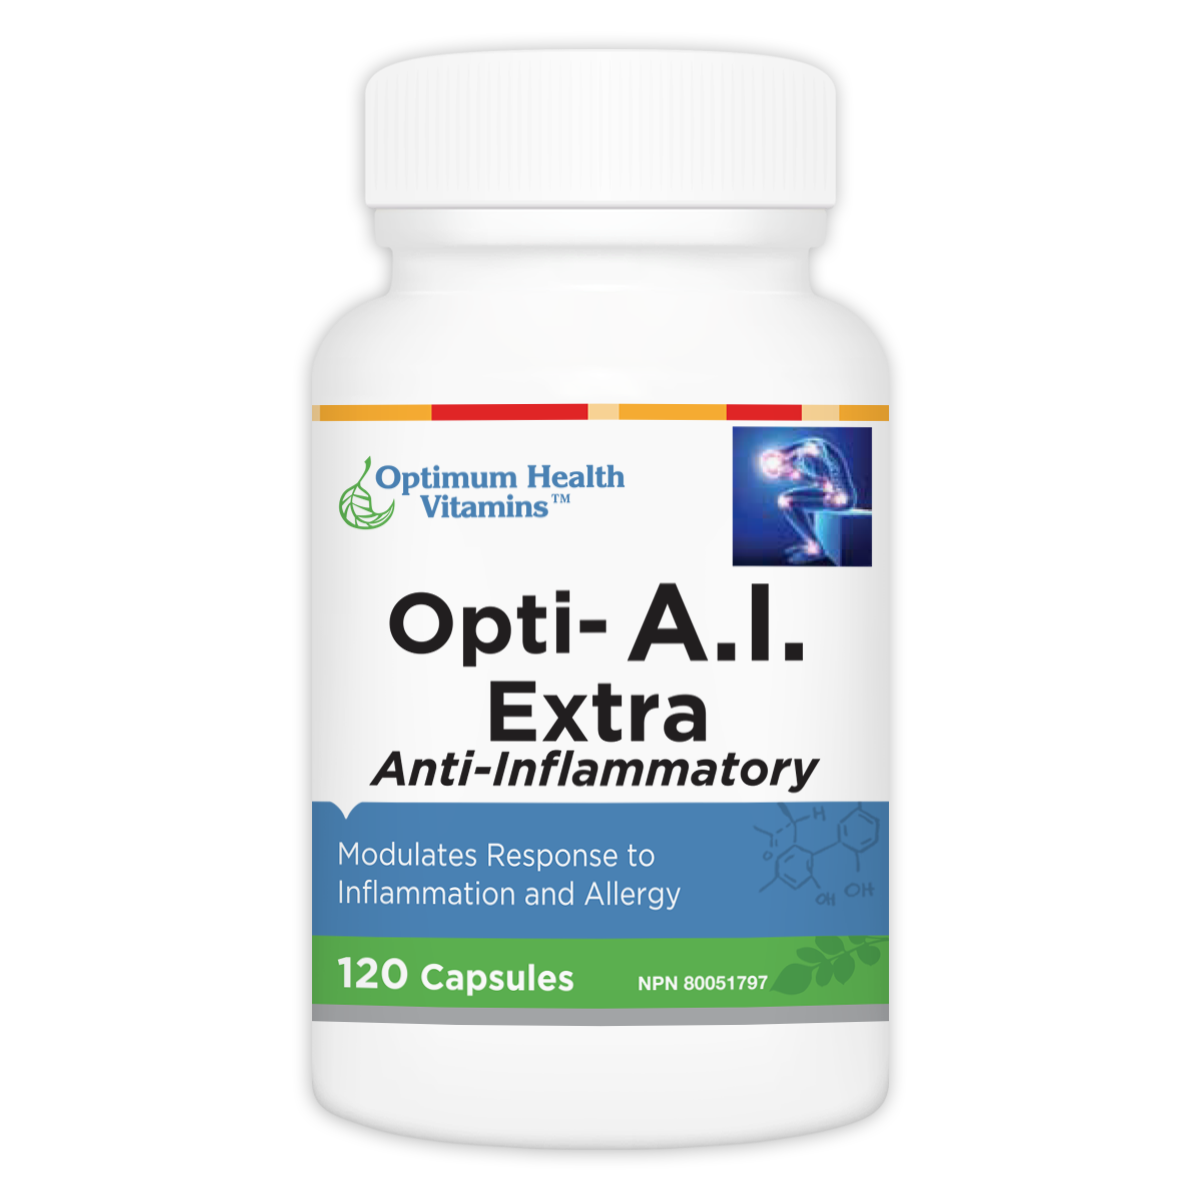 Optimum Health Vitamins Opti A.I. Extra